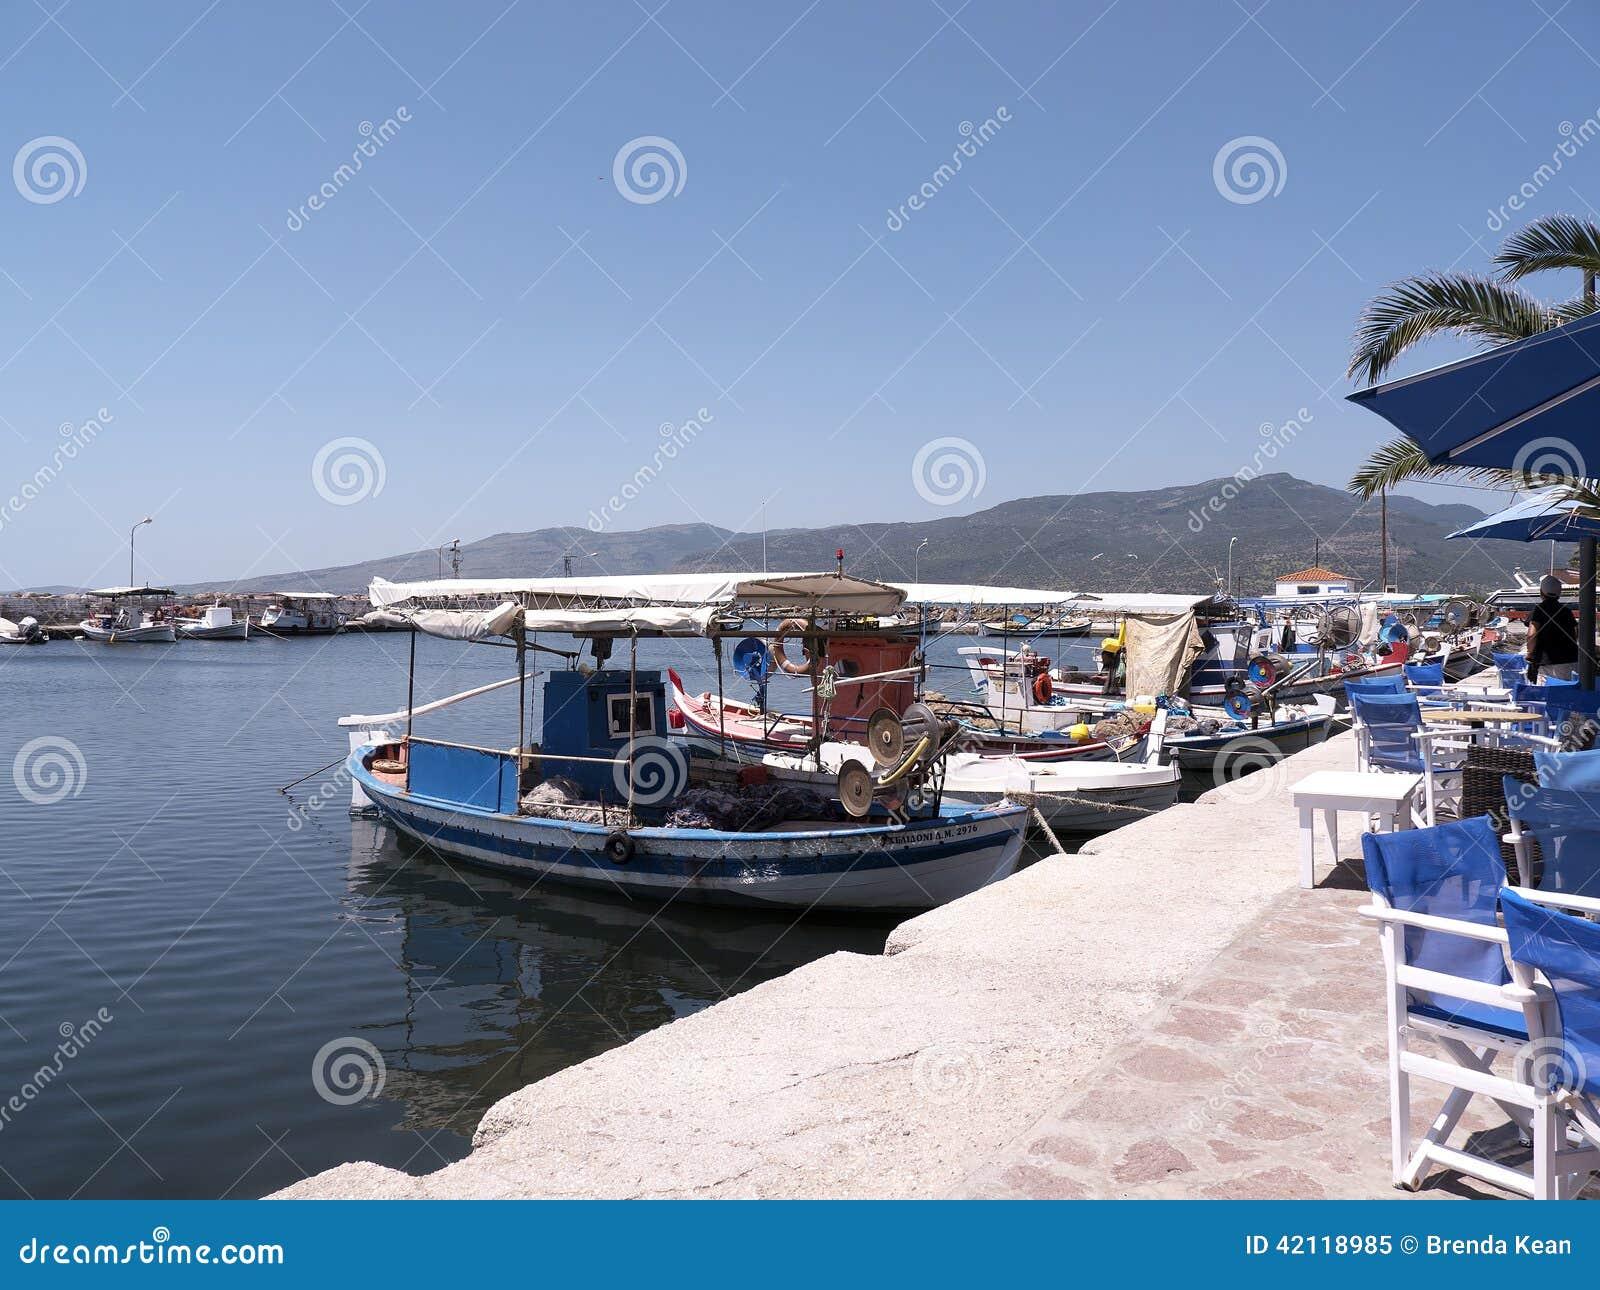 The Harbour at Skala Kalloni Lesvos Greece